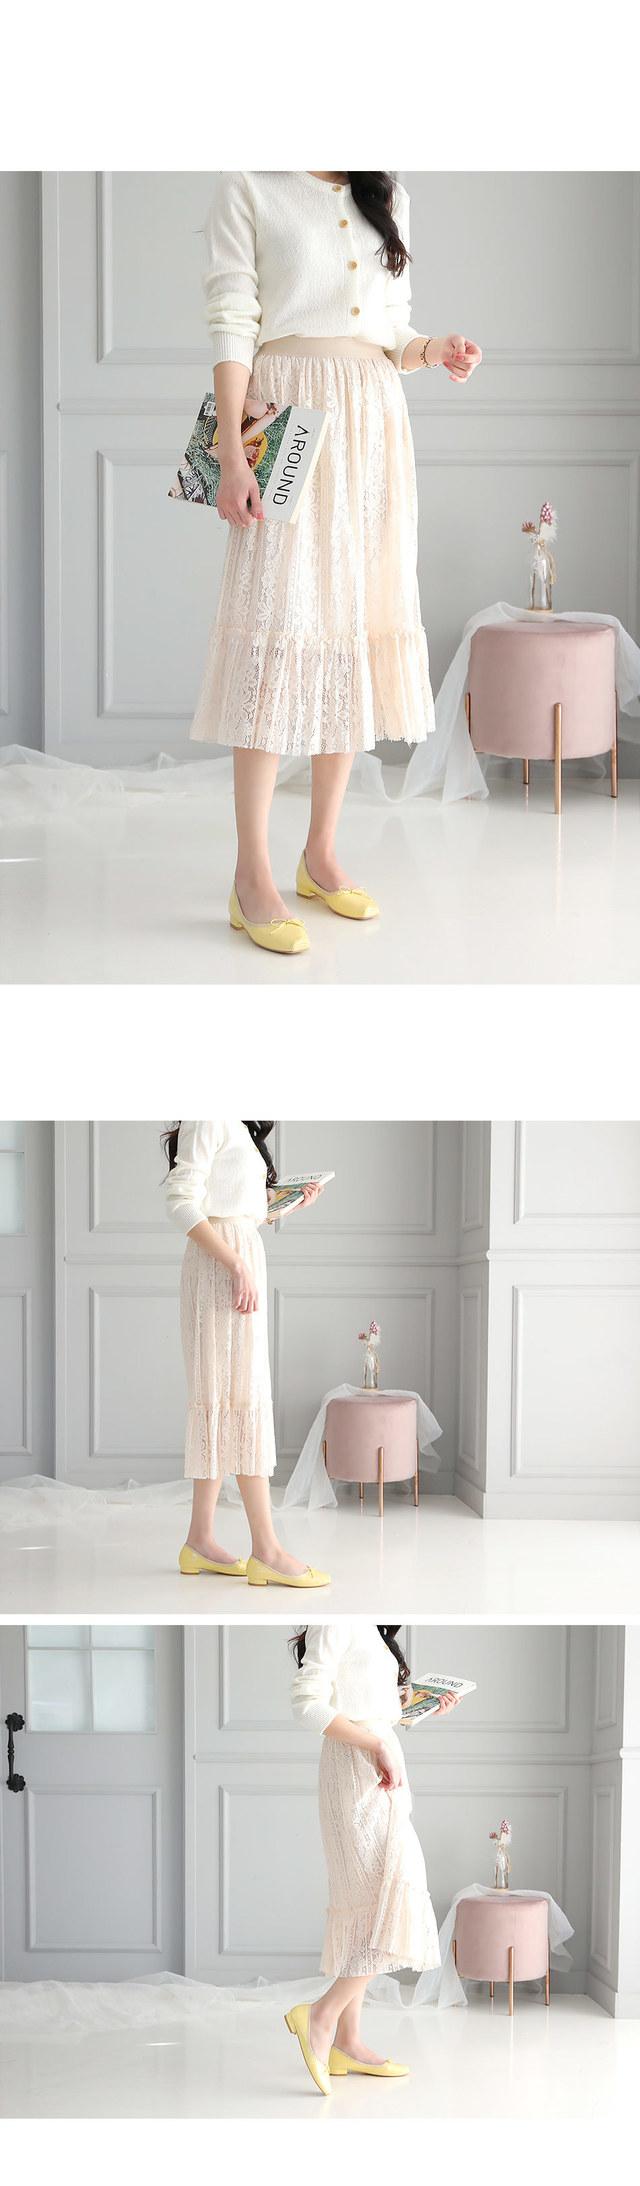 Denas Flat Shoes 2cm